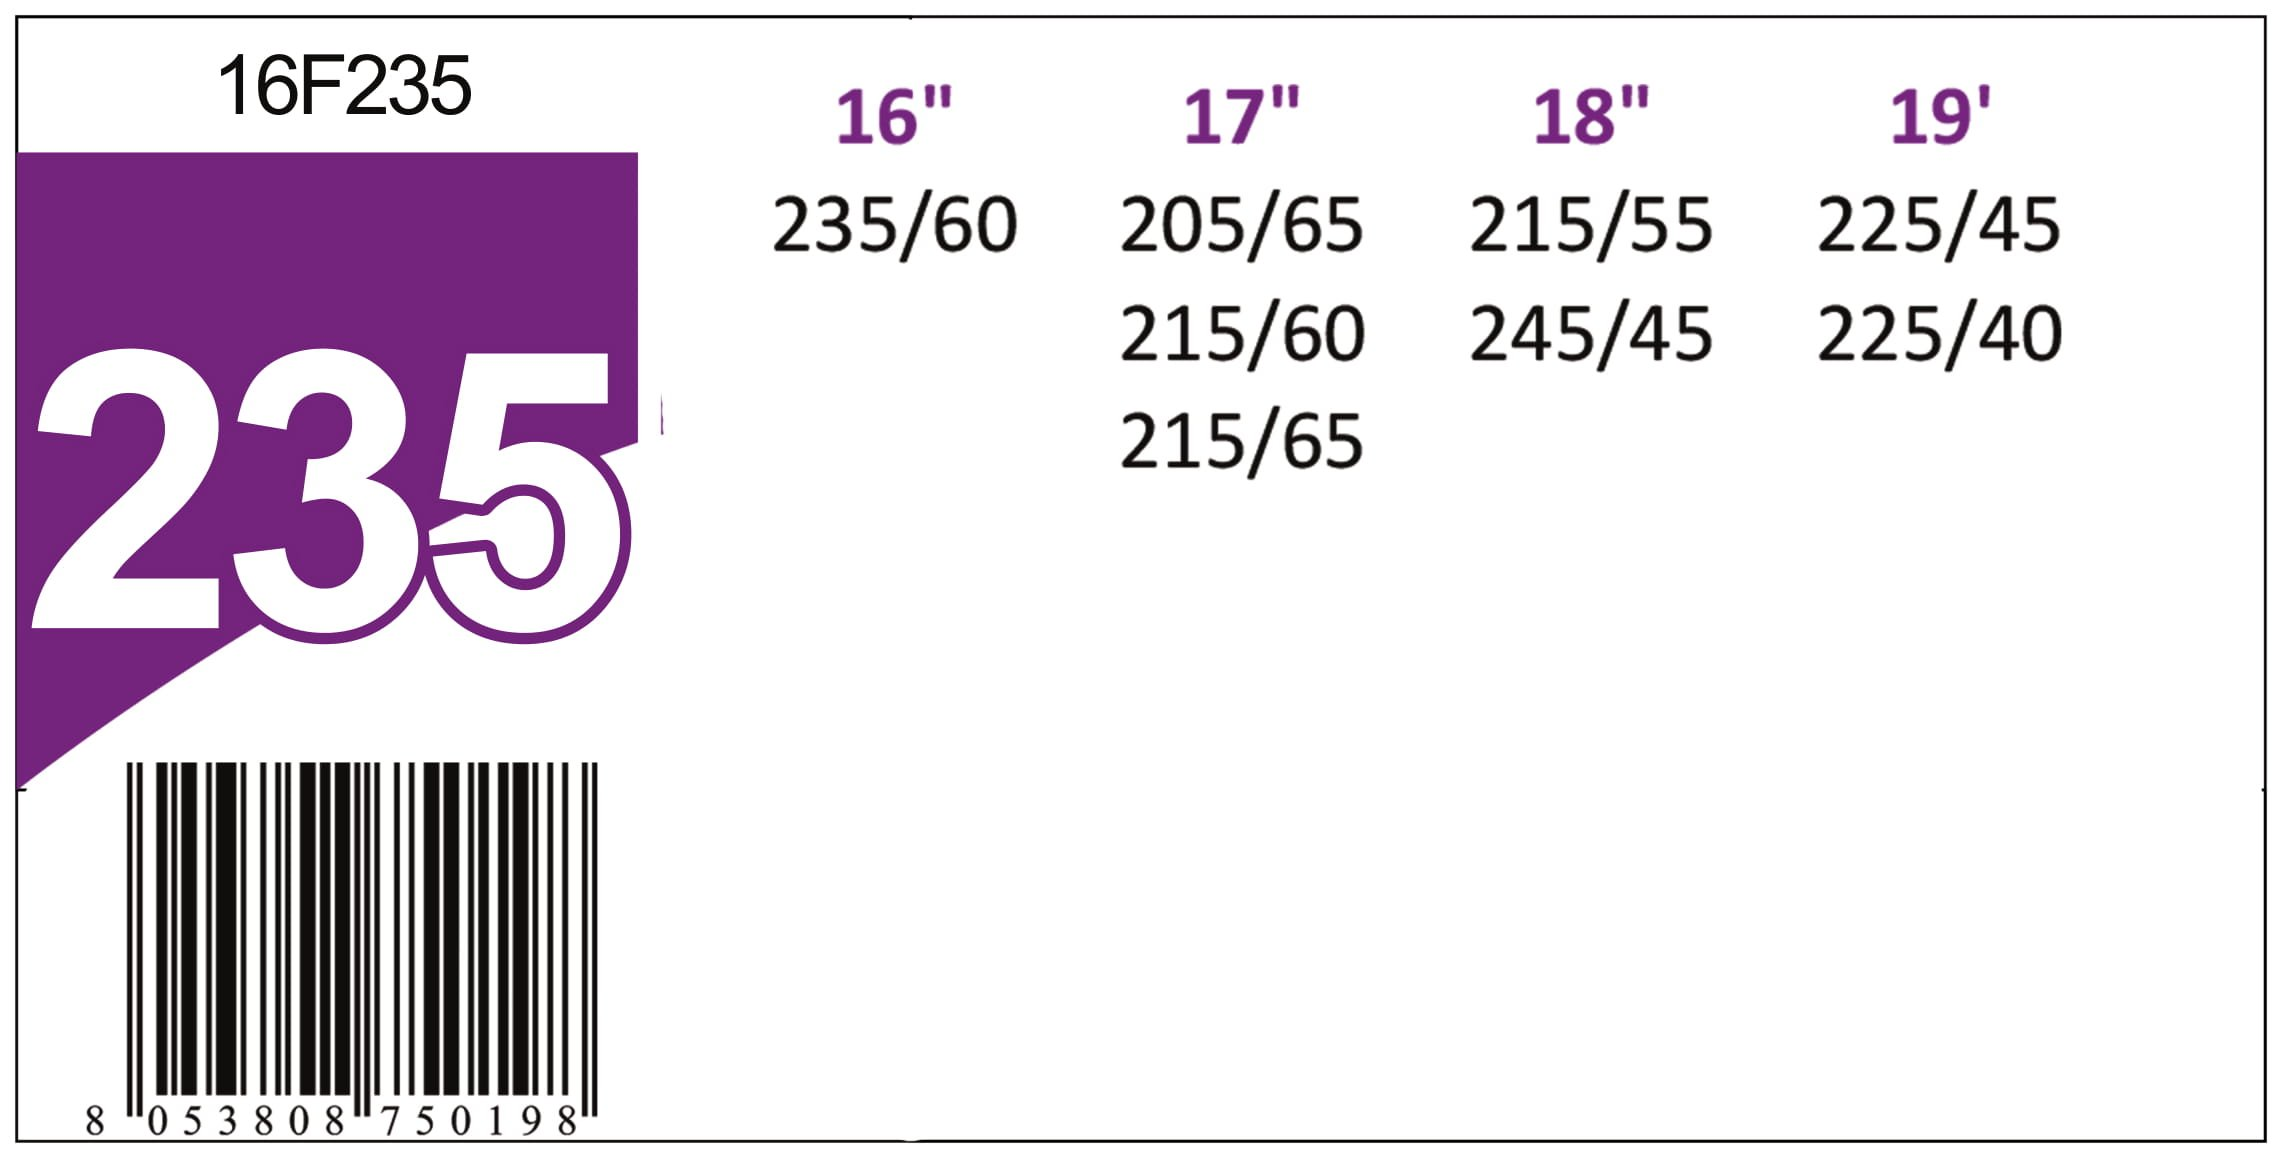 POWER GRIP Catene da Neve 16mm Gruppo 235, Omologate TUV e GS Onorm, 16F235